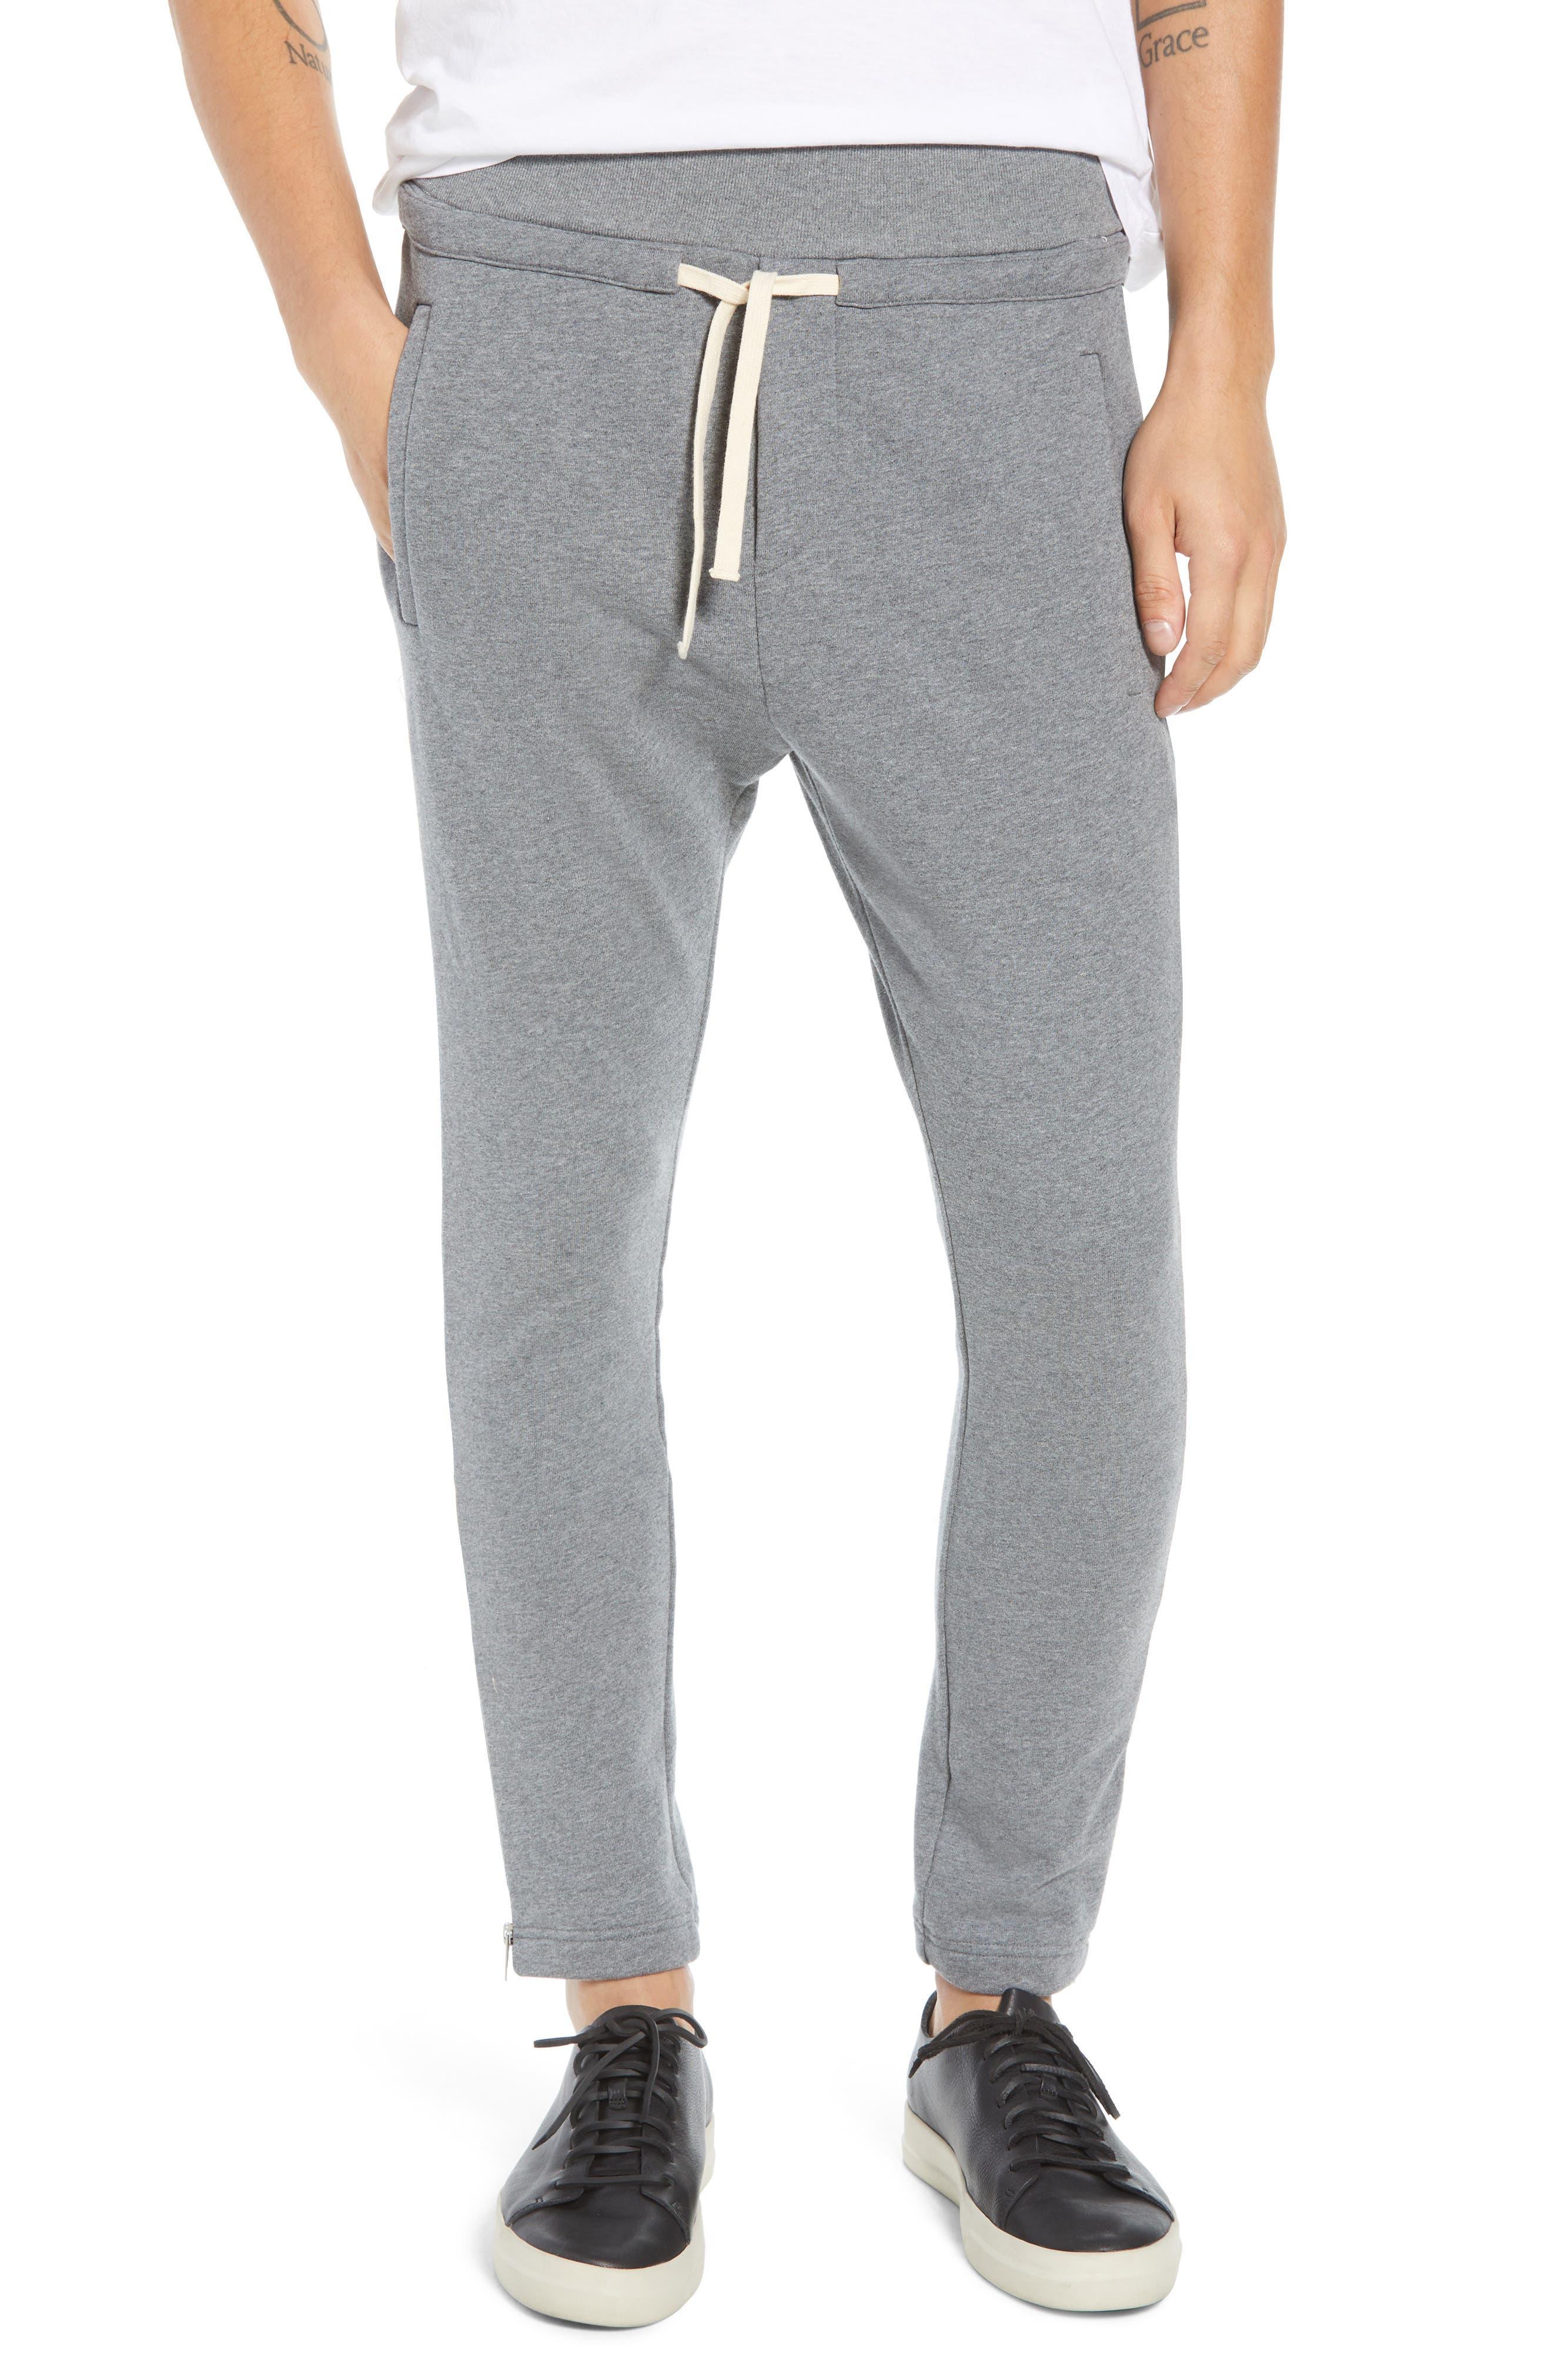 THE KOOPLES Fleece Slim Fit Sweatpants in Grey